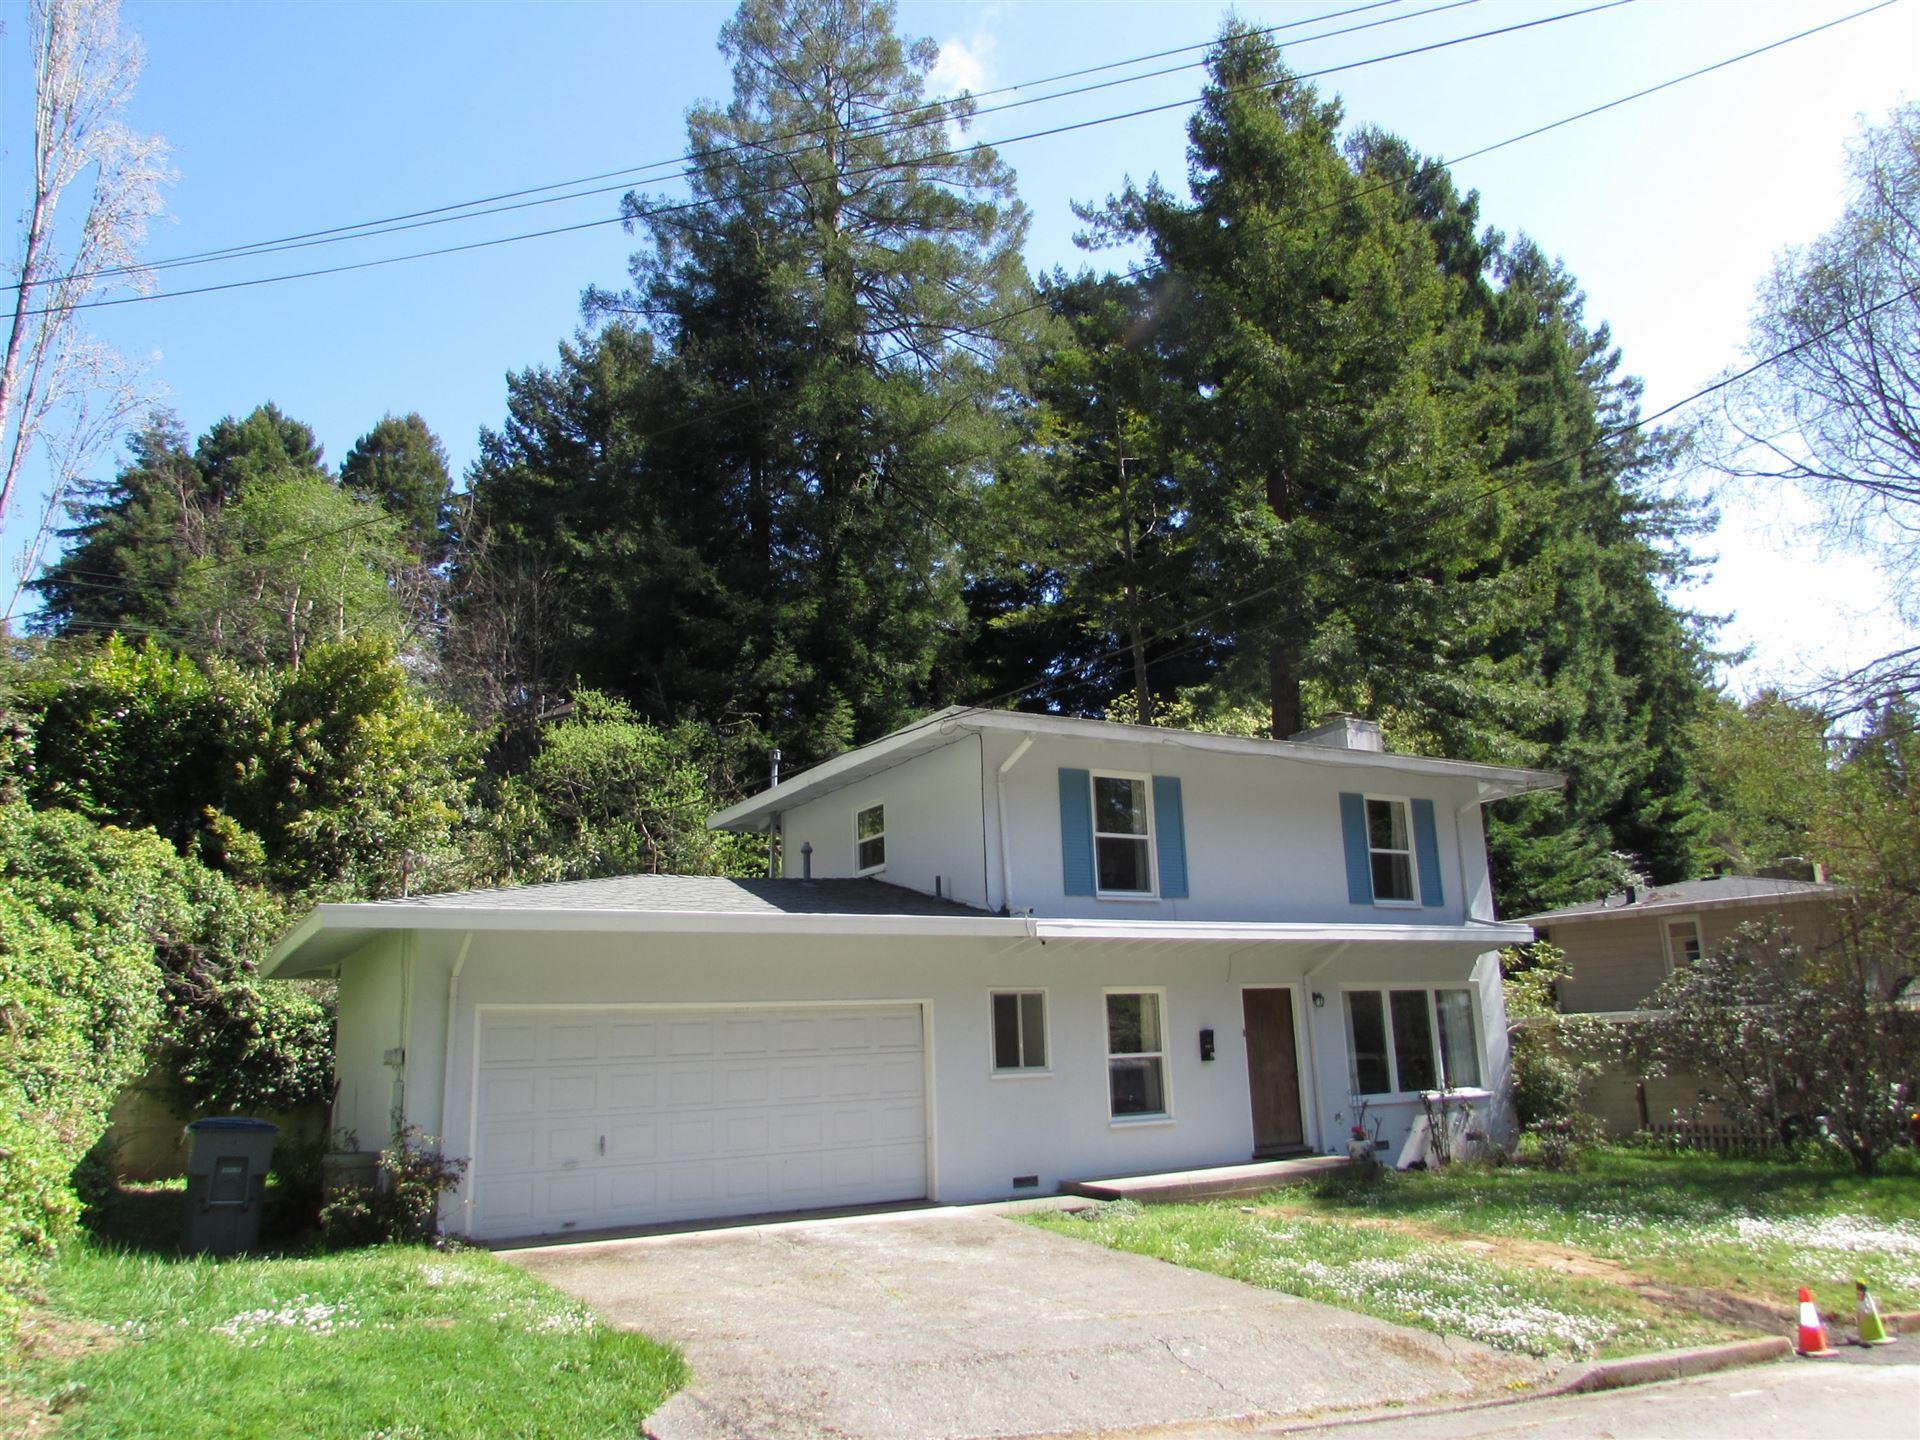 716 Patrick Court, Arcata, CA 95521 - MLS#: 258758